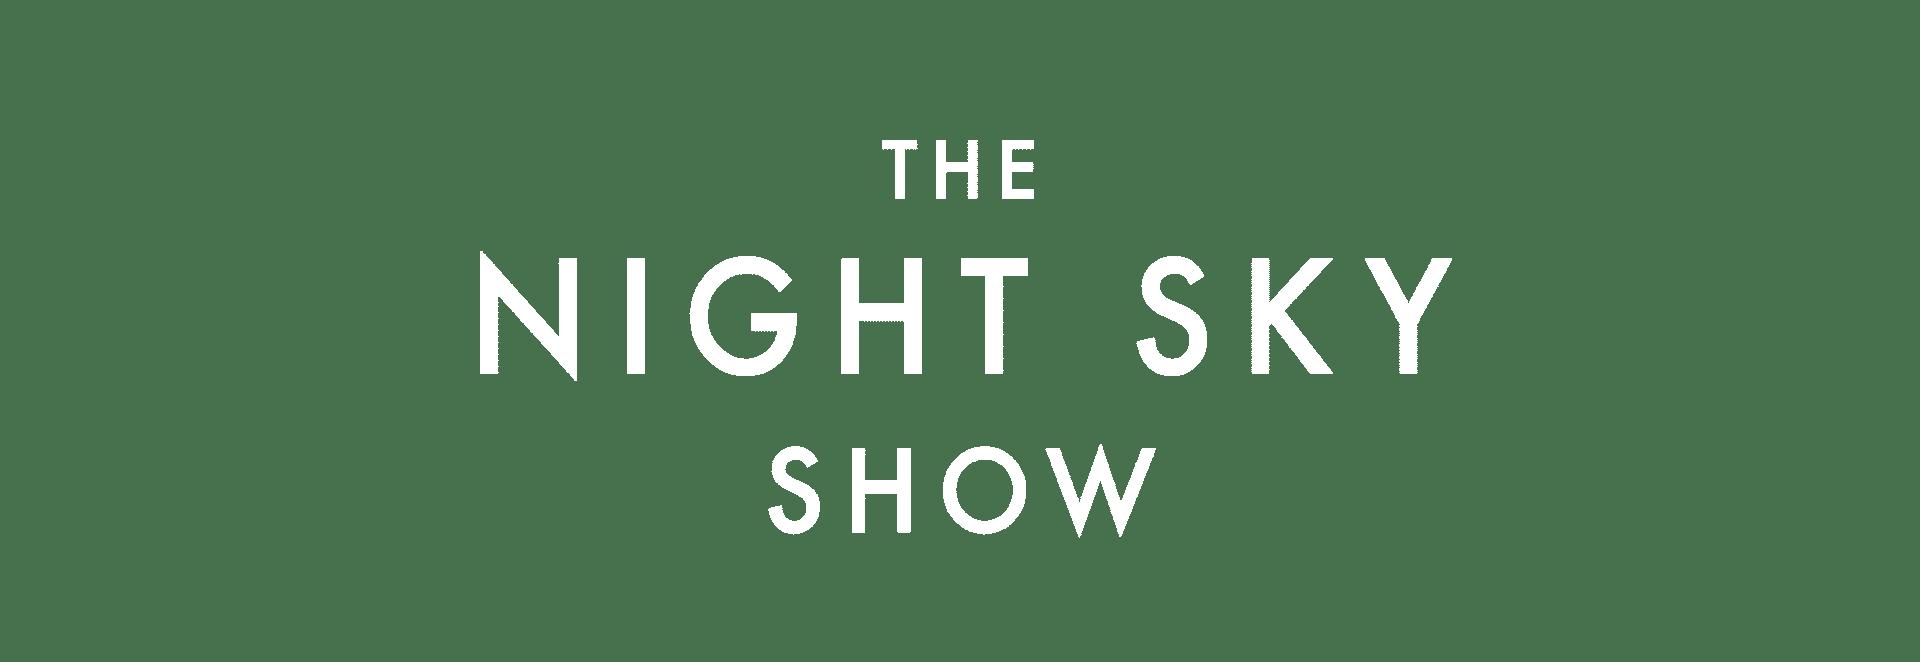 Night Sky Show, Night Sky, Astronomy, Stargazing, Cosmos, Universe, Theatre, Show, entertaining, enjoy